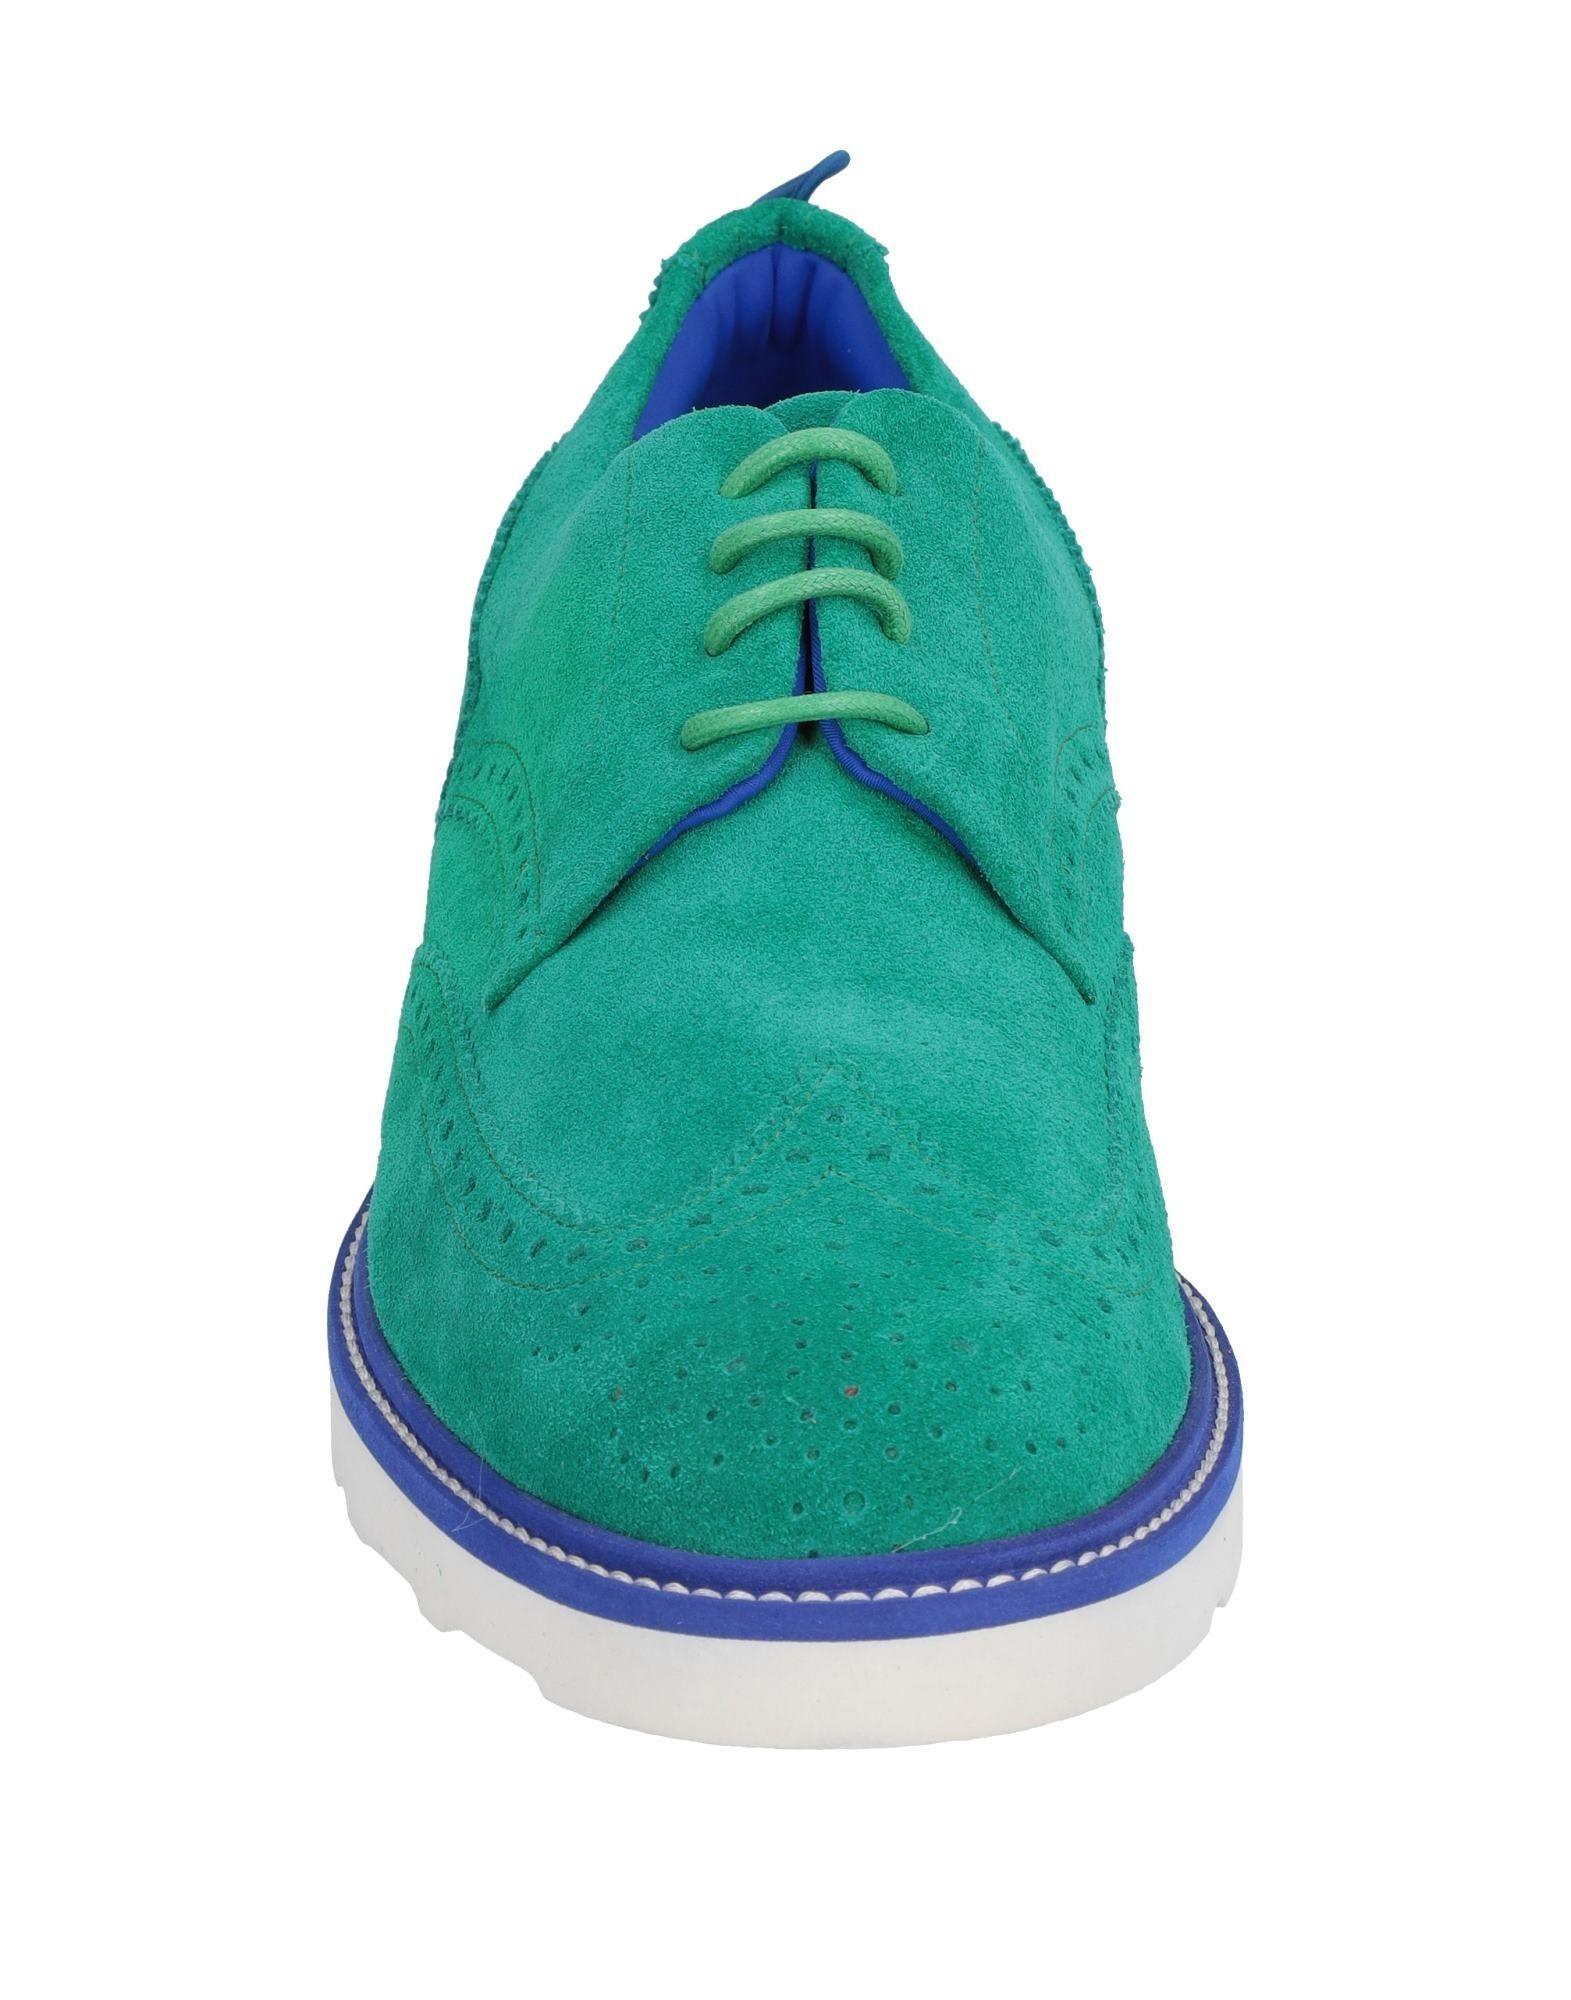 Rabatt echte  Schuhe Pulchrum! Schnürschuhe Herren  echte 11182169QB 3f3271